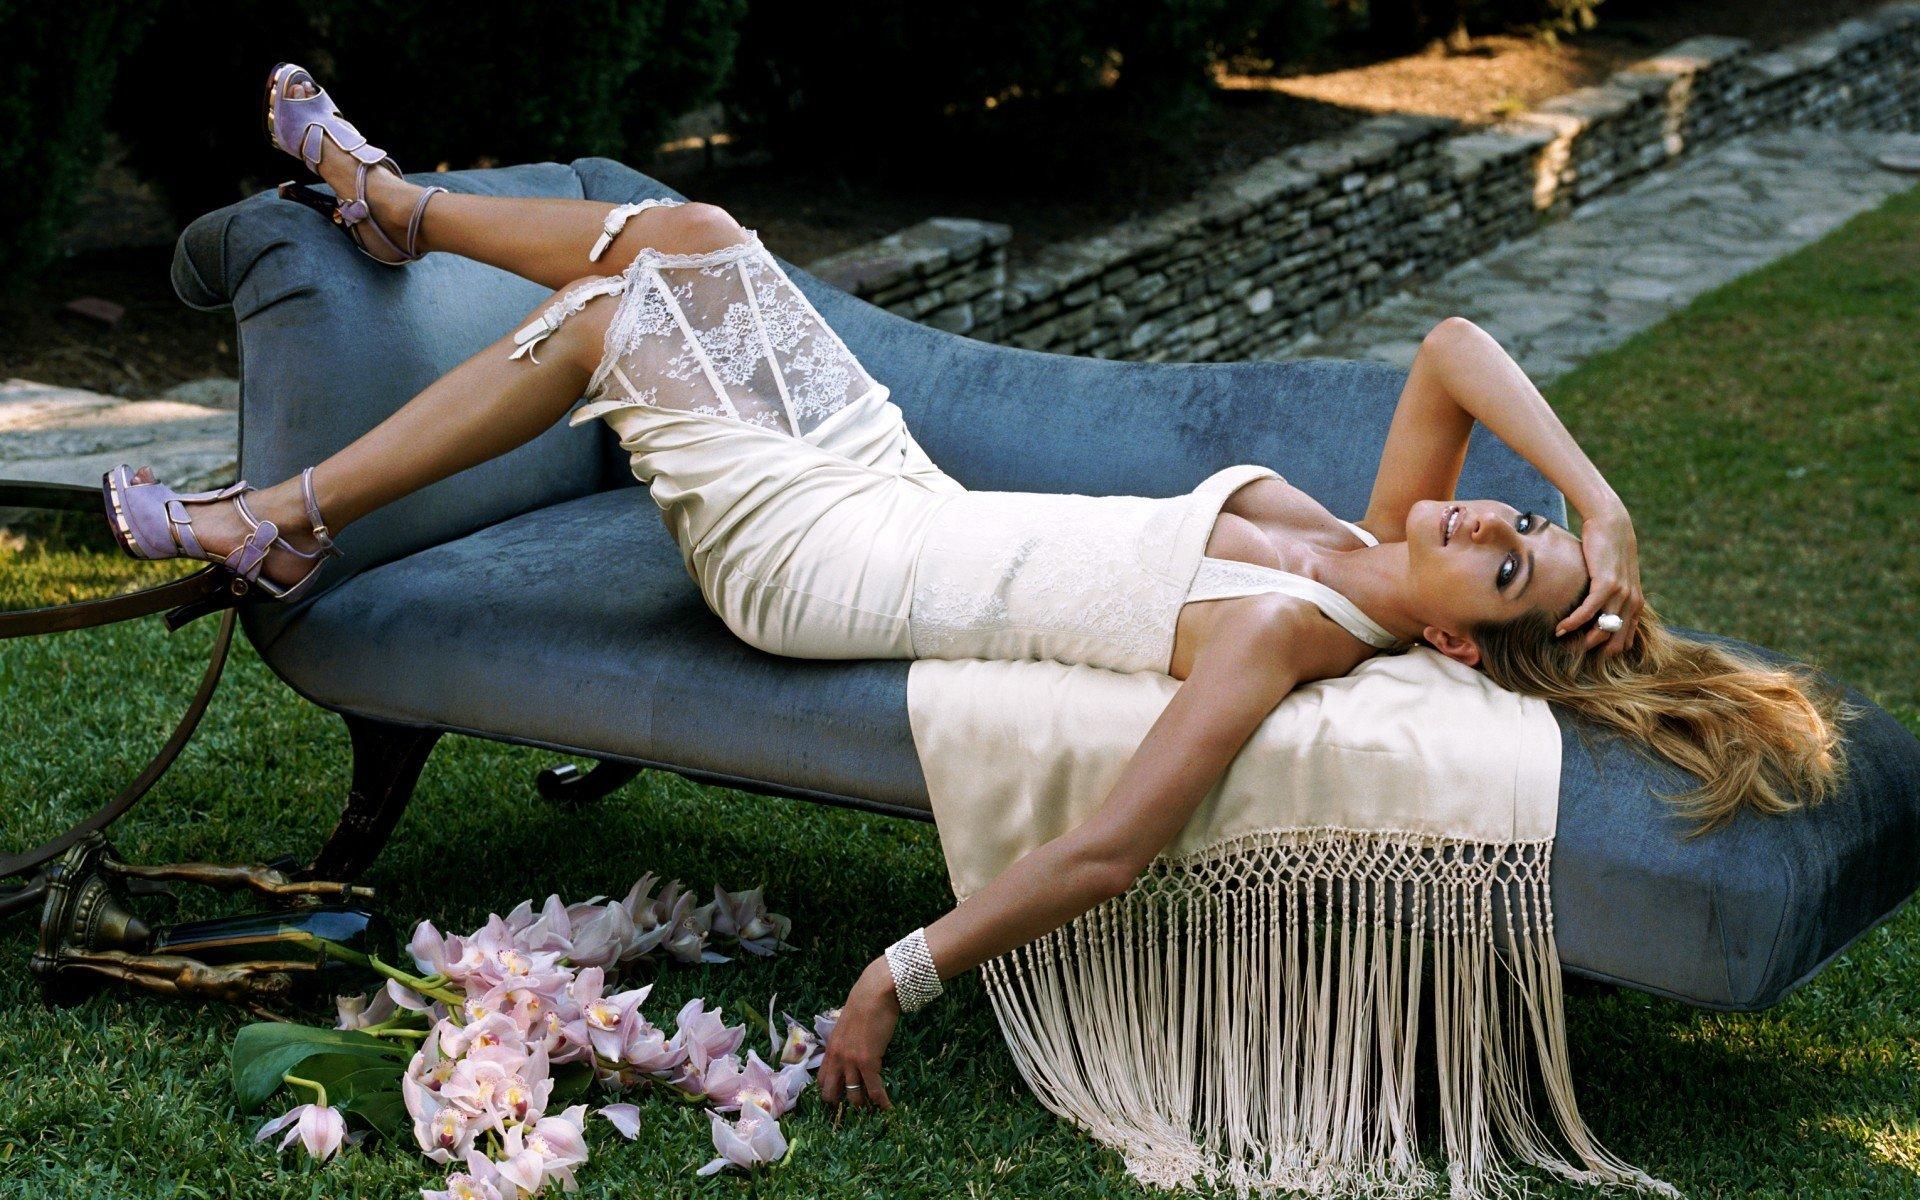 Women, Jennifer Aniston, Blonde, Lying Down, High Heels, Dress, White Dress, Cleavage